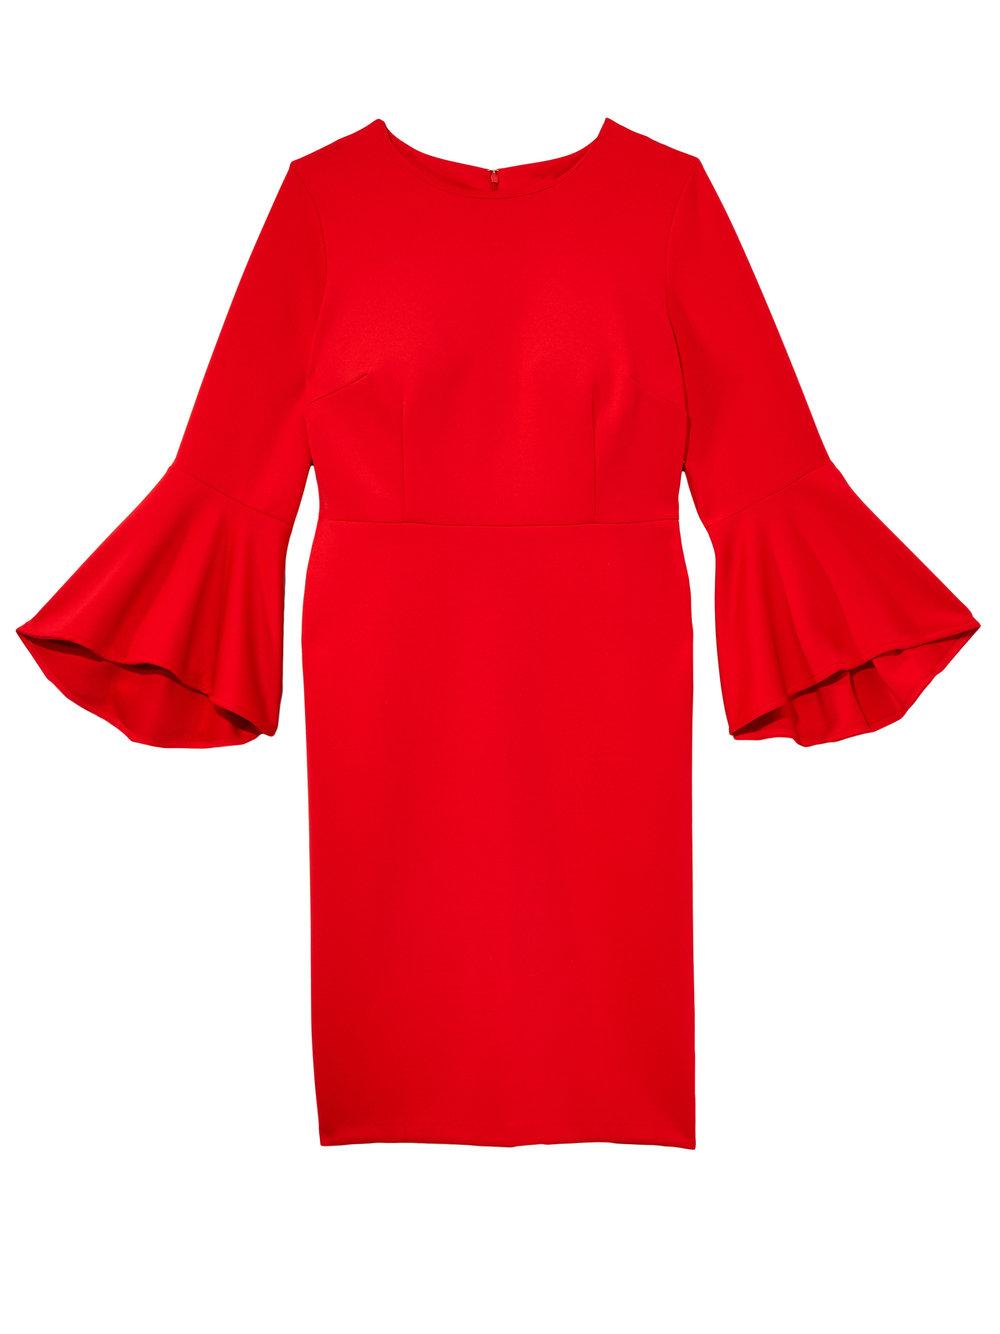 curvy-con-dress-11.jpg